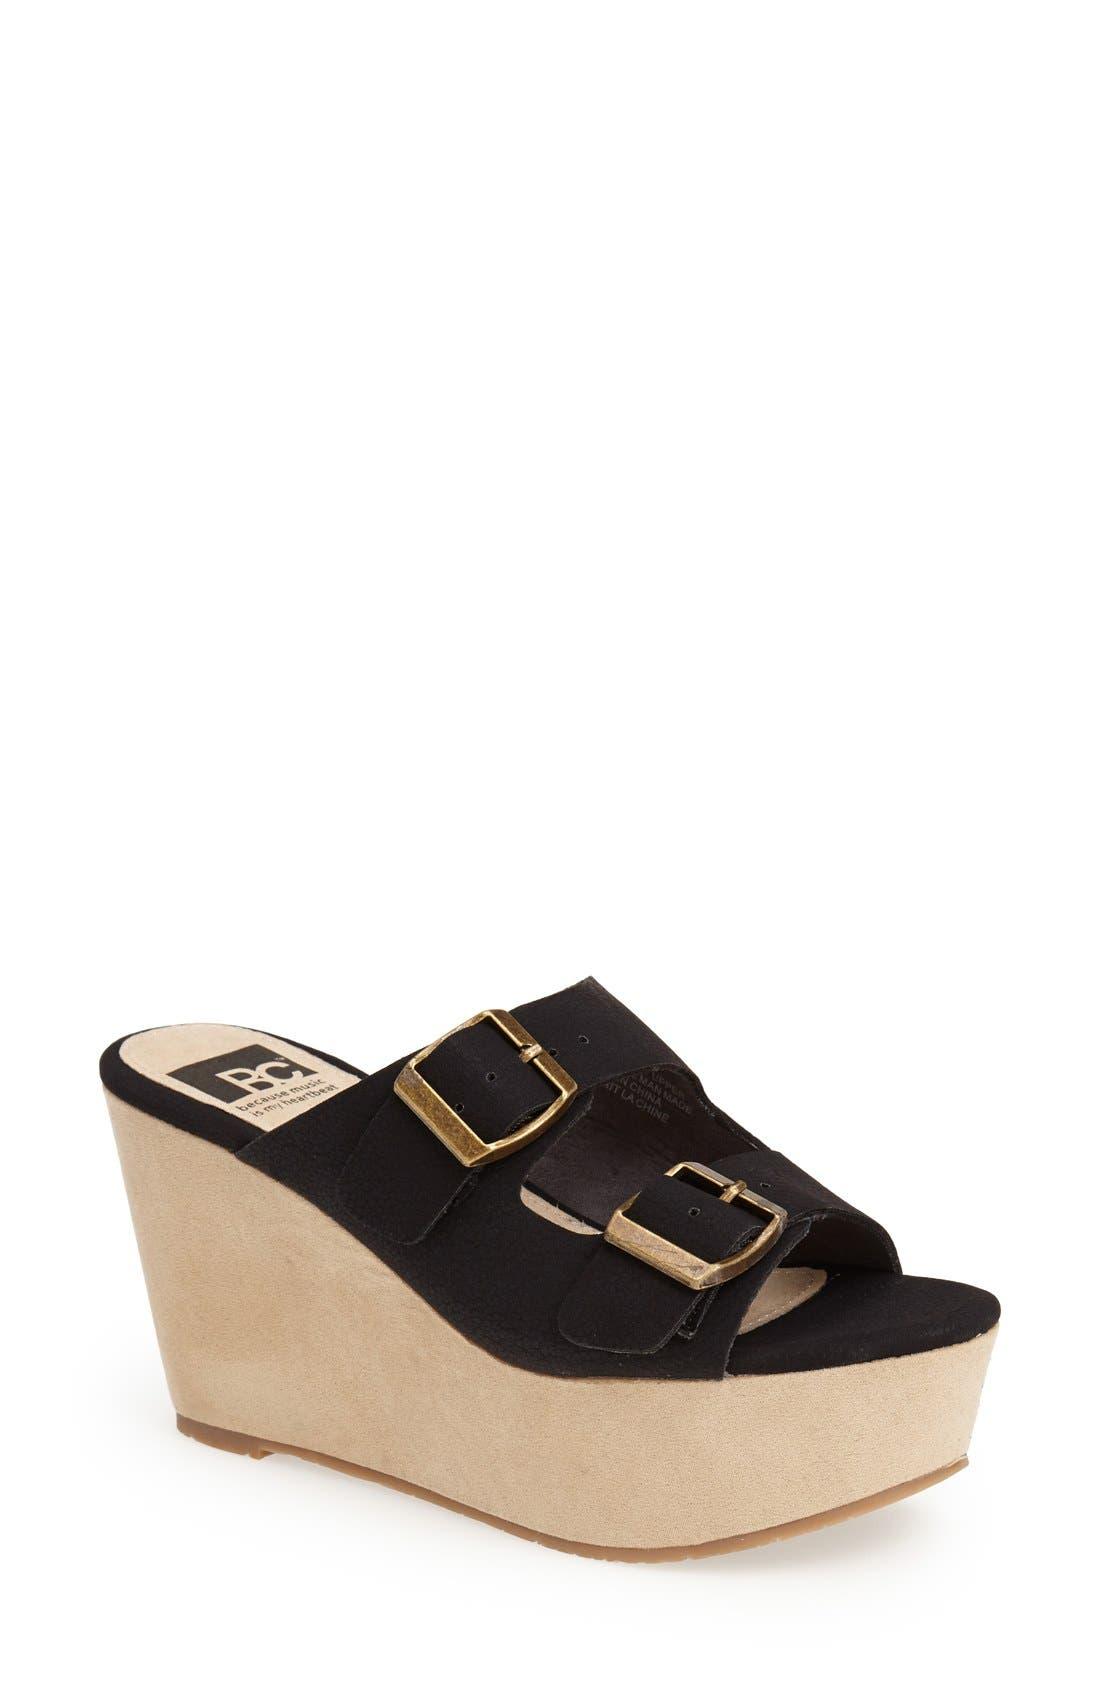 Alternate Image 1 Selected - BC Footwear 'Mayhem' Platform Sandal (Women)